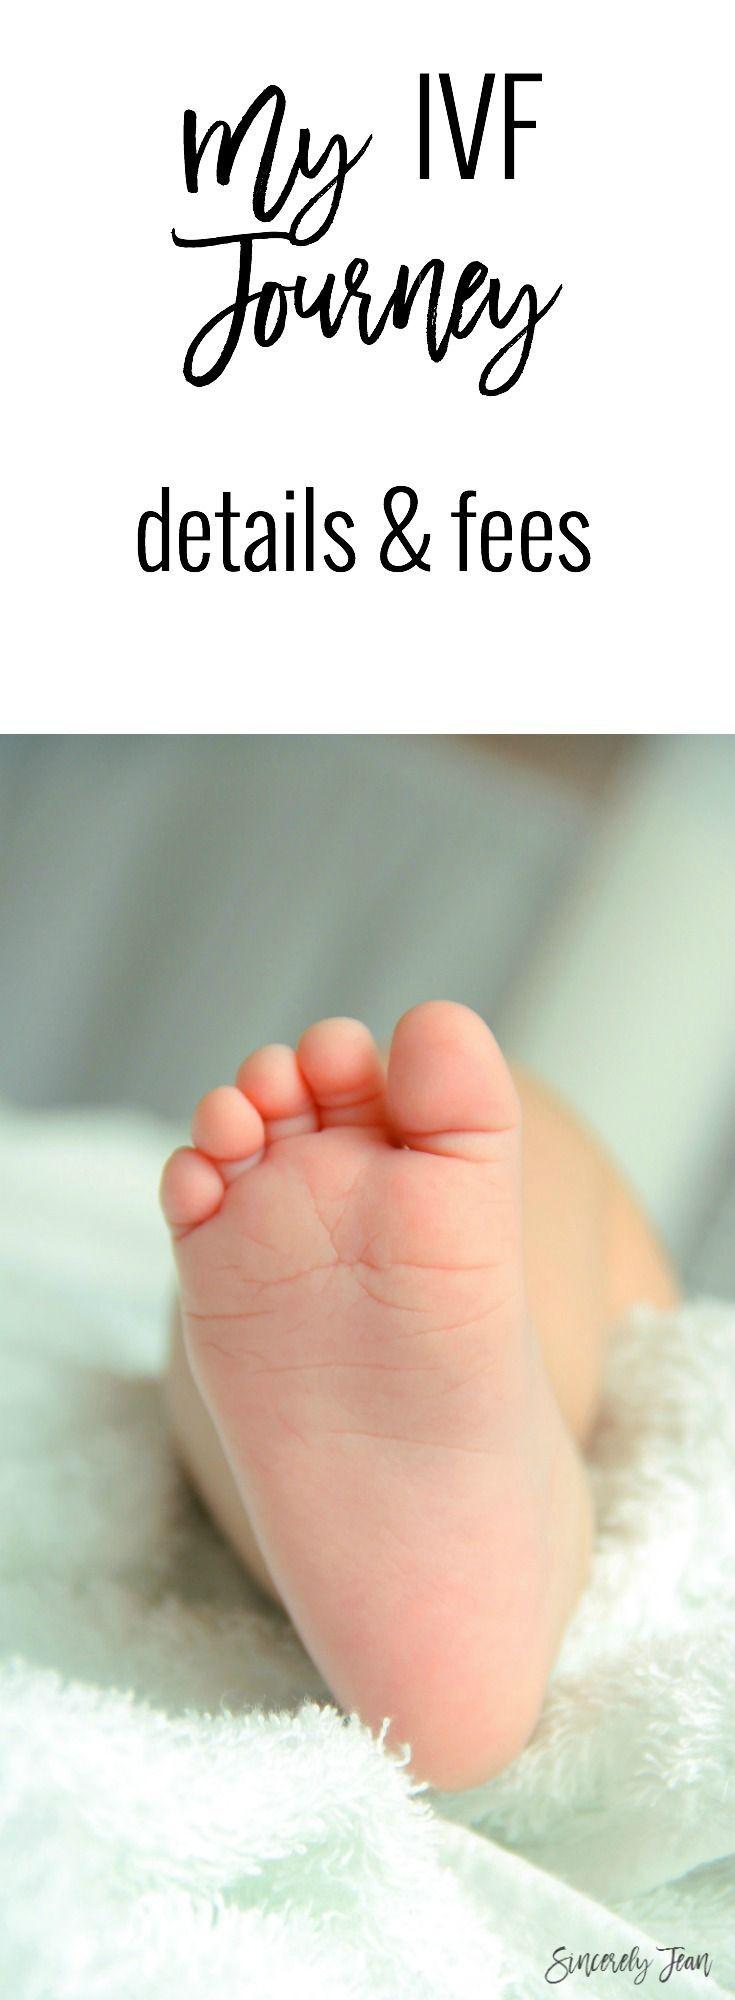 My ivf journey details and fees by SincerelyJean.com #ivf #In #Vitro #Fertilization #fertility #infertility #baby #fees #cost